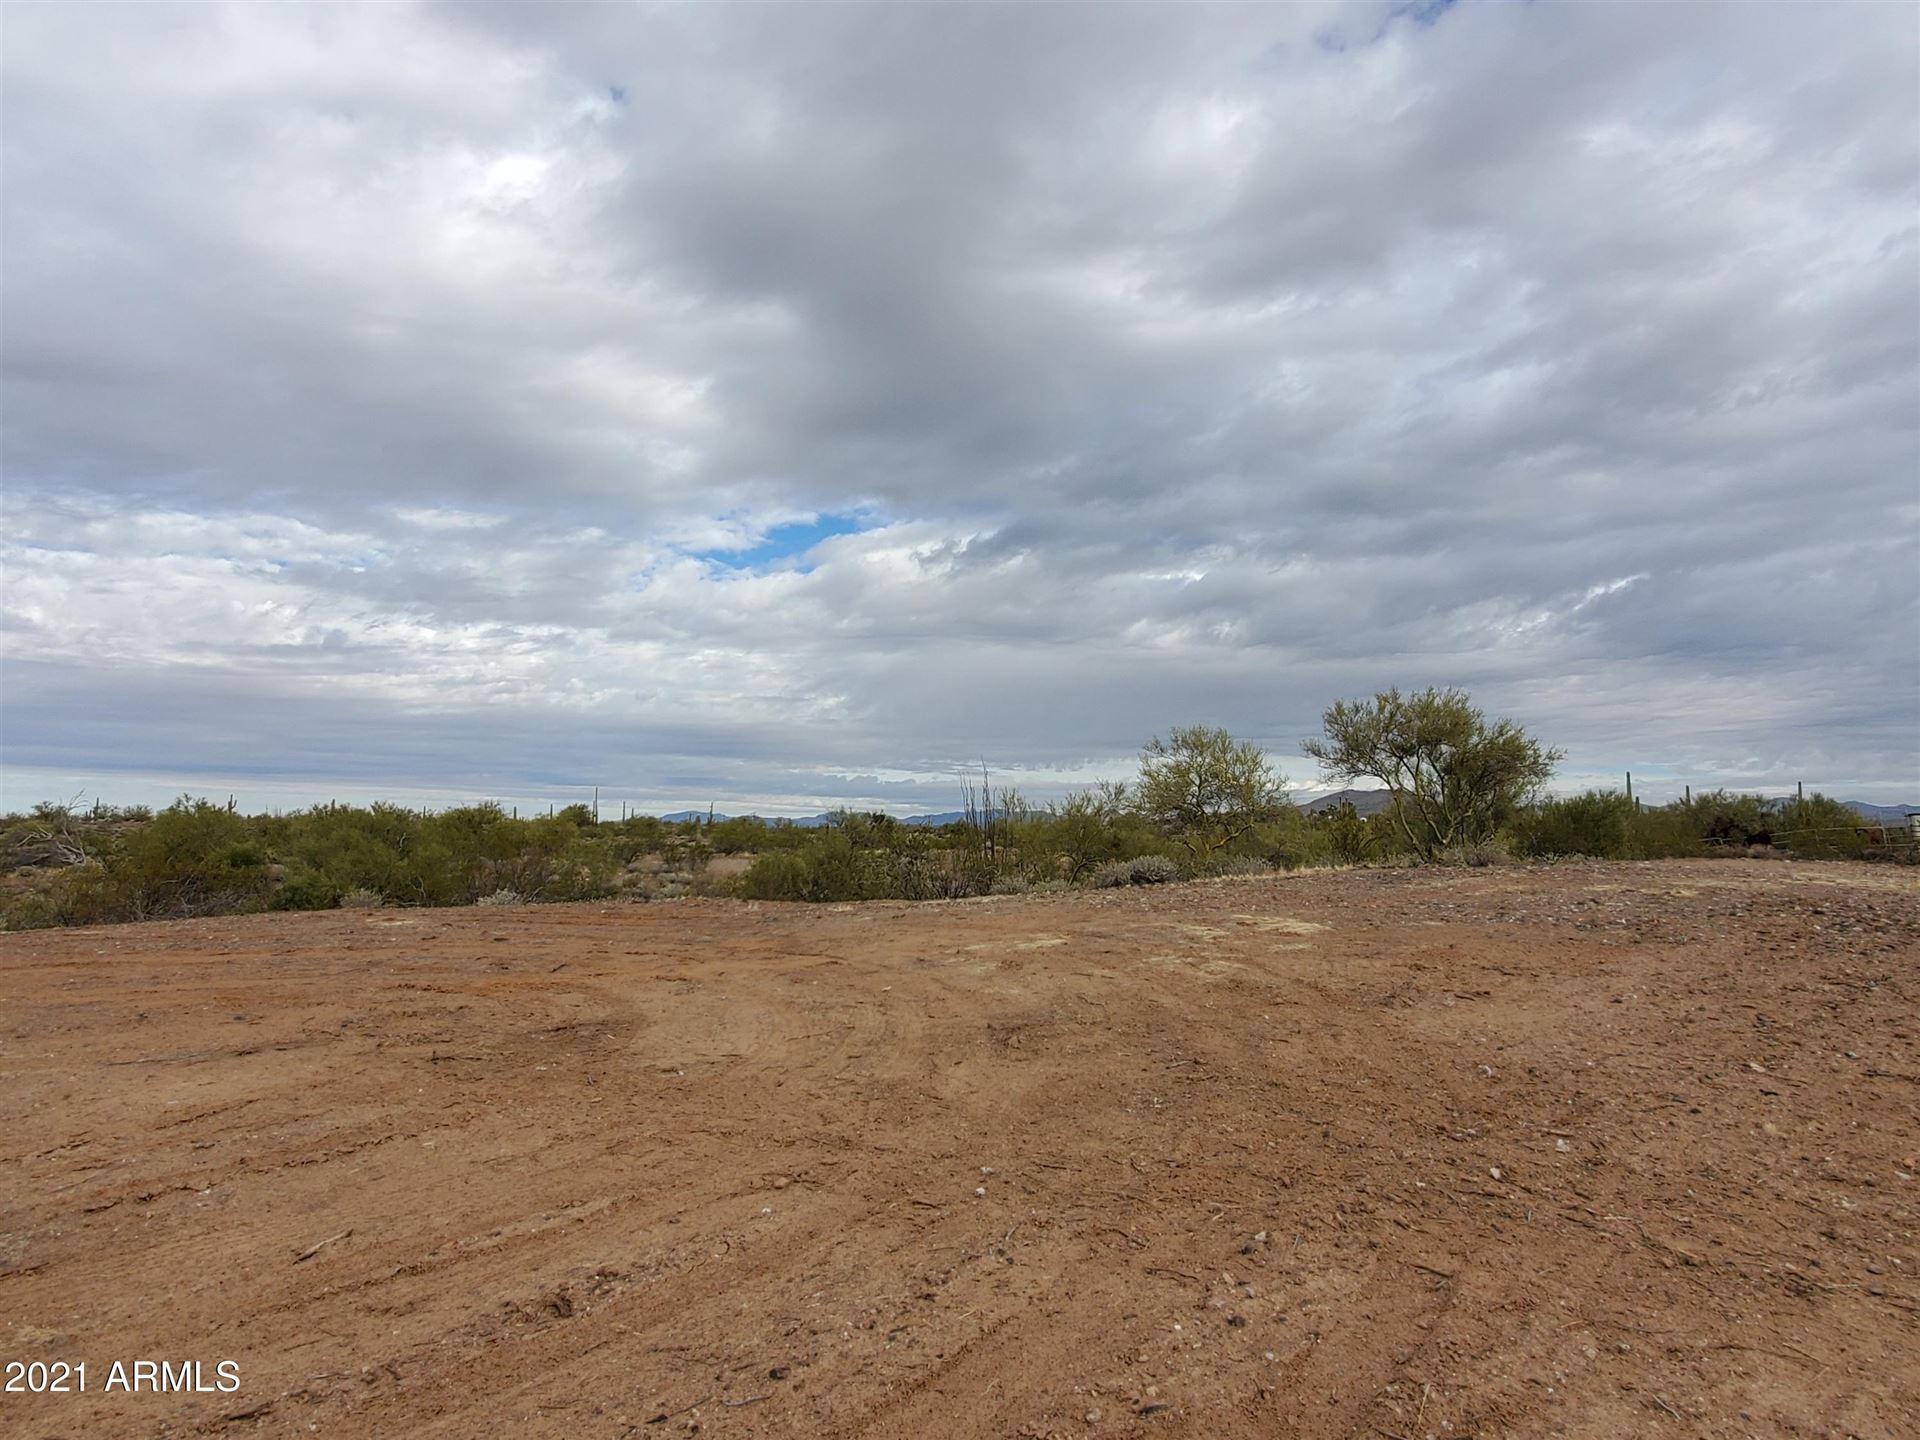 Photo of 0 N 264th Dr. Avenue, Morristown, AZ 85342 (MLS # 6189421)